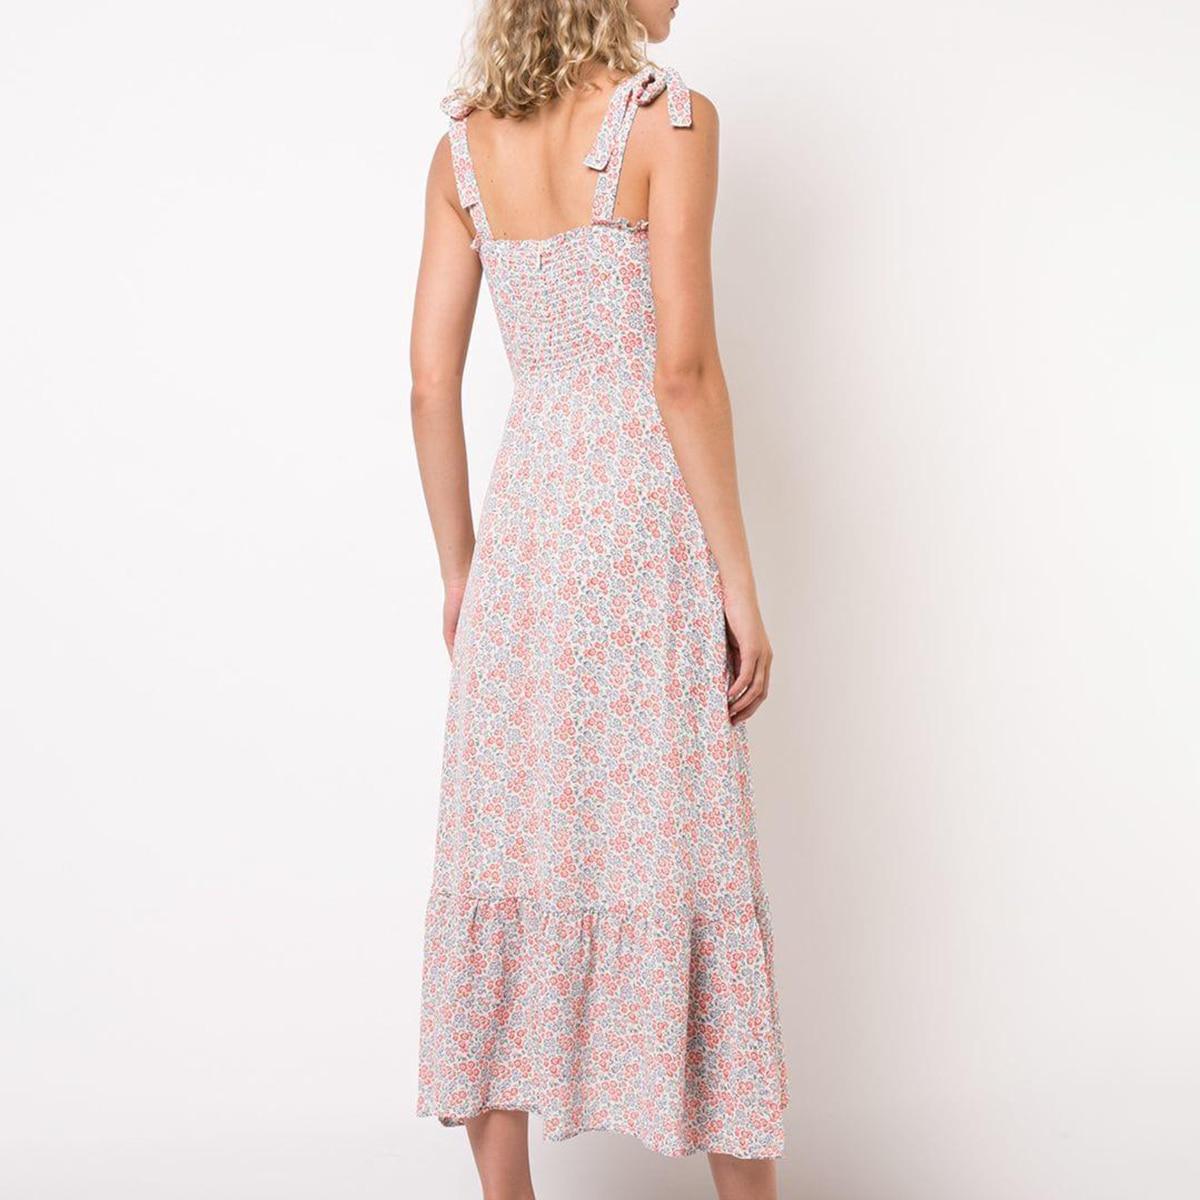 840356be30b89 Nikita Vintage Midi Dress Women Chic 2019 Summer Strapless Sleeveless Sexy  Dress Ladies Retro Floral Print Party Club Dress - lztees